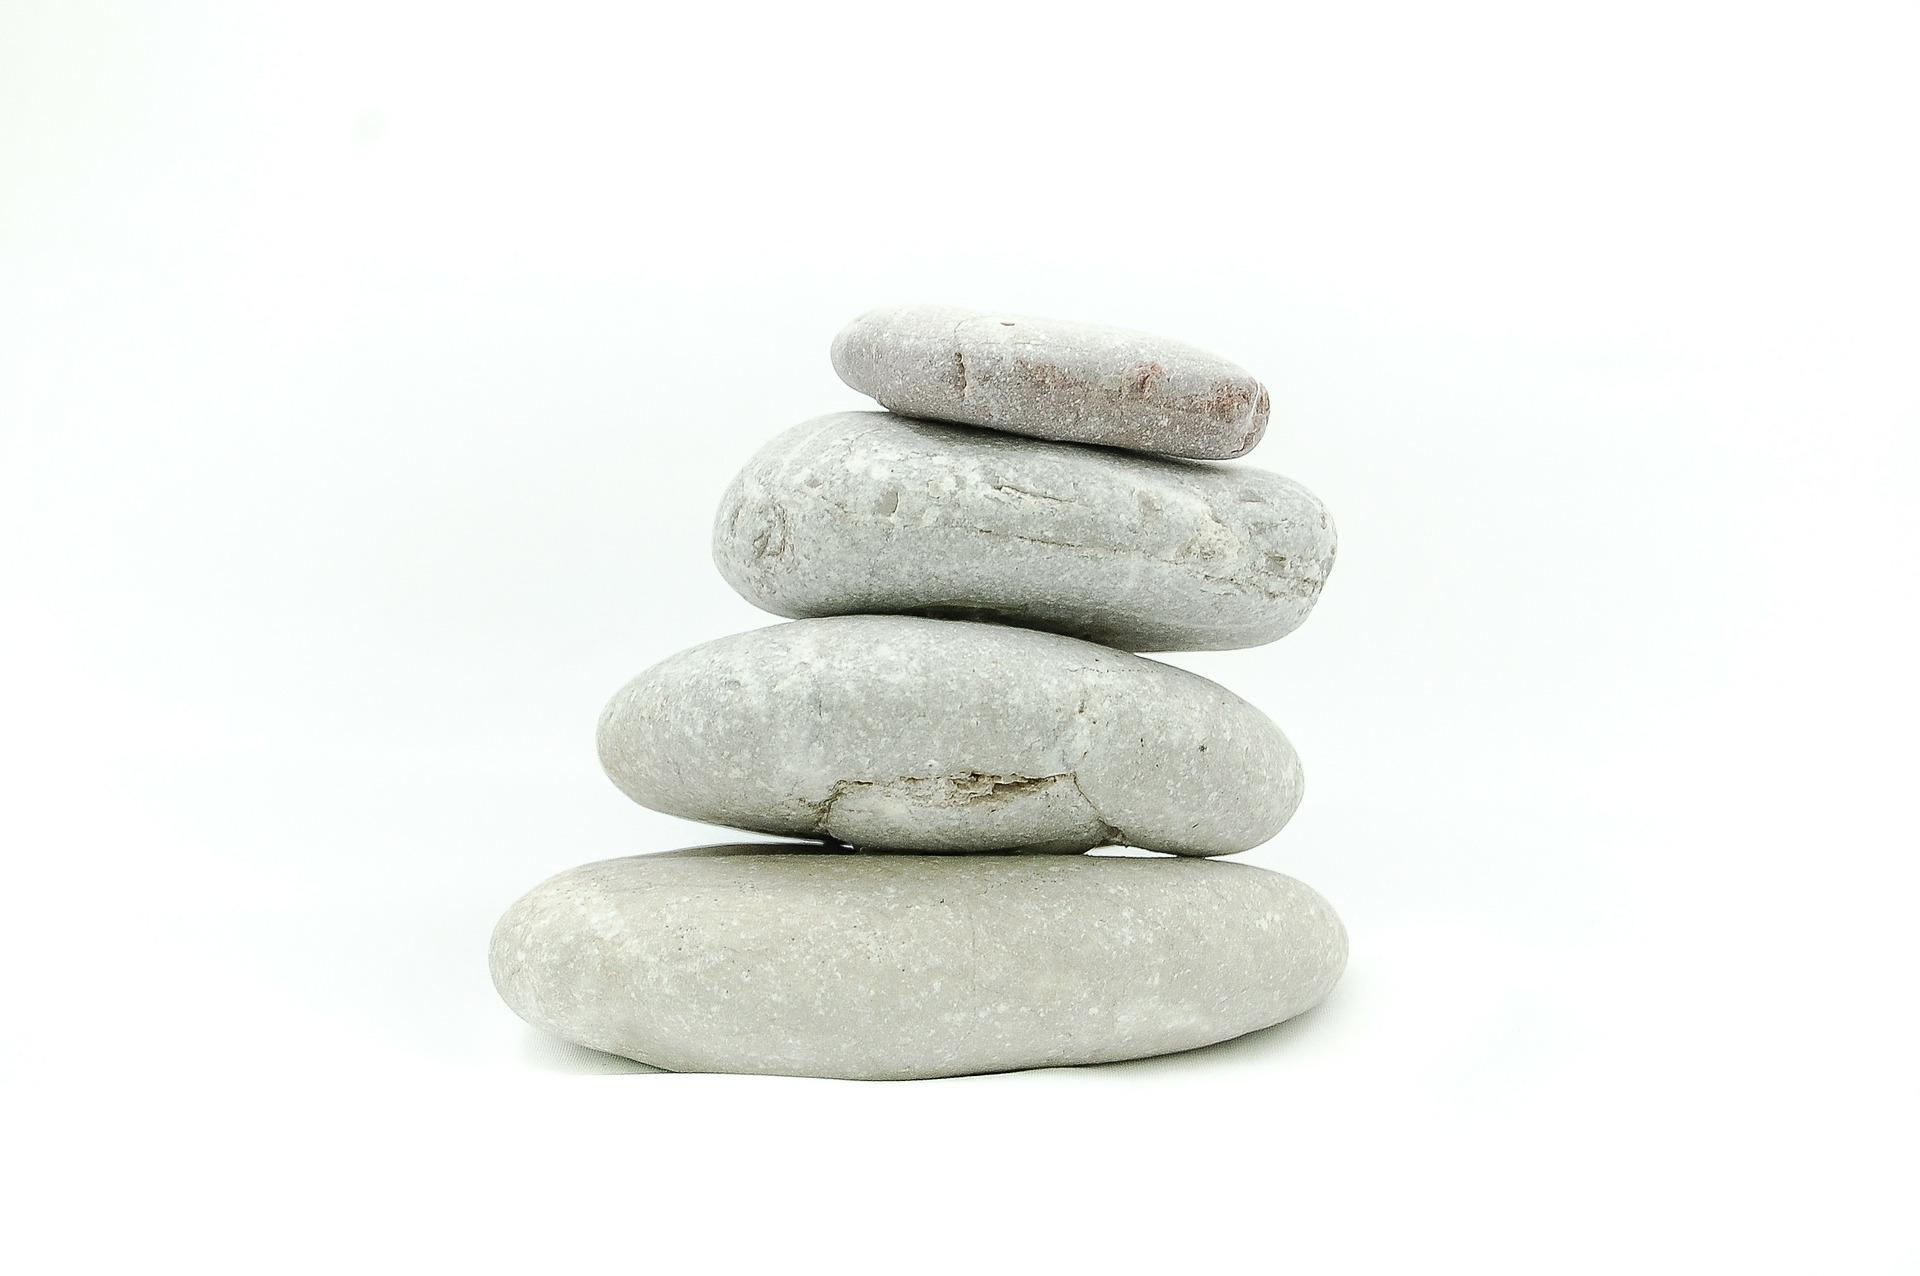 Randnotiz Zur Meditation